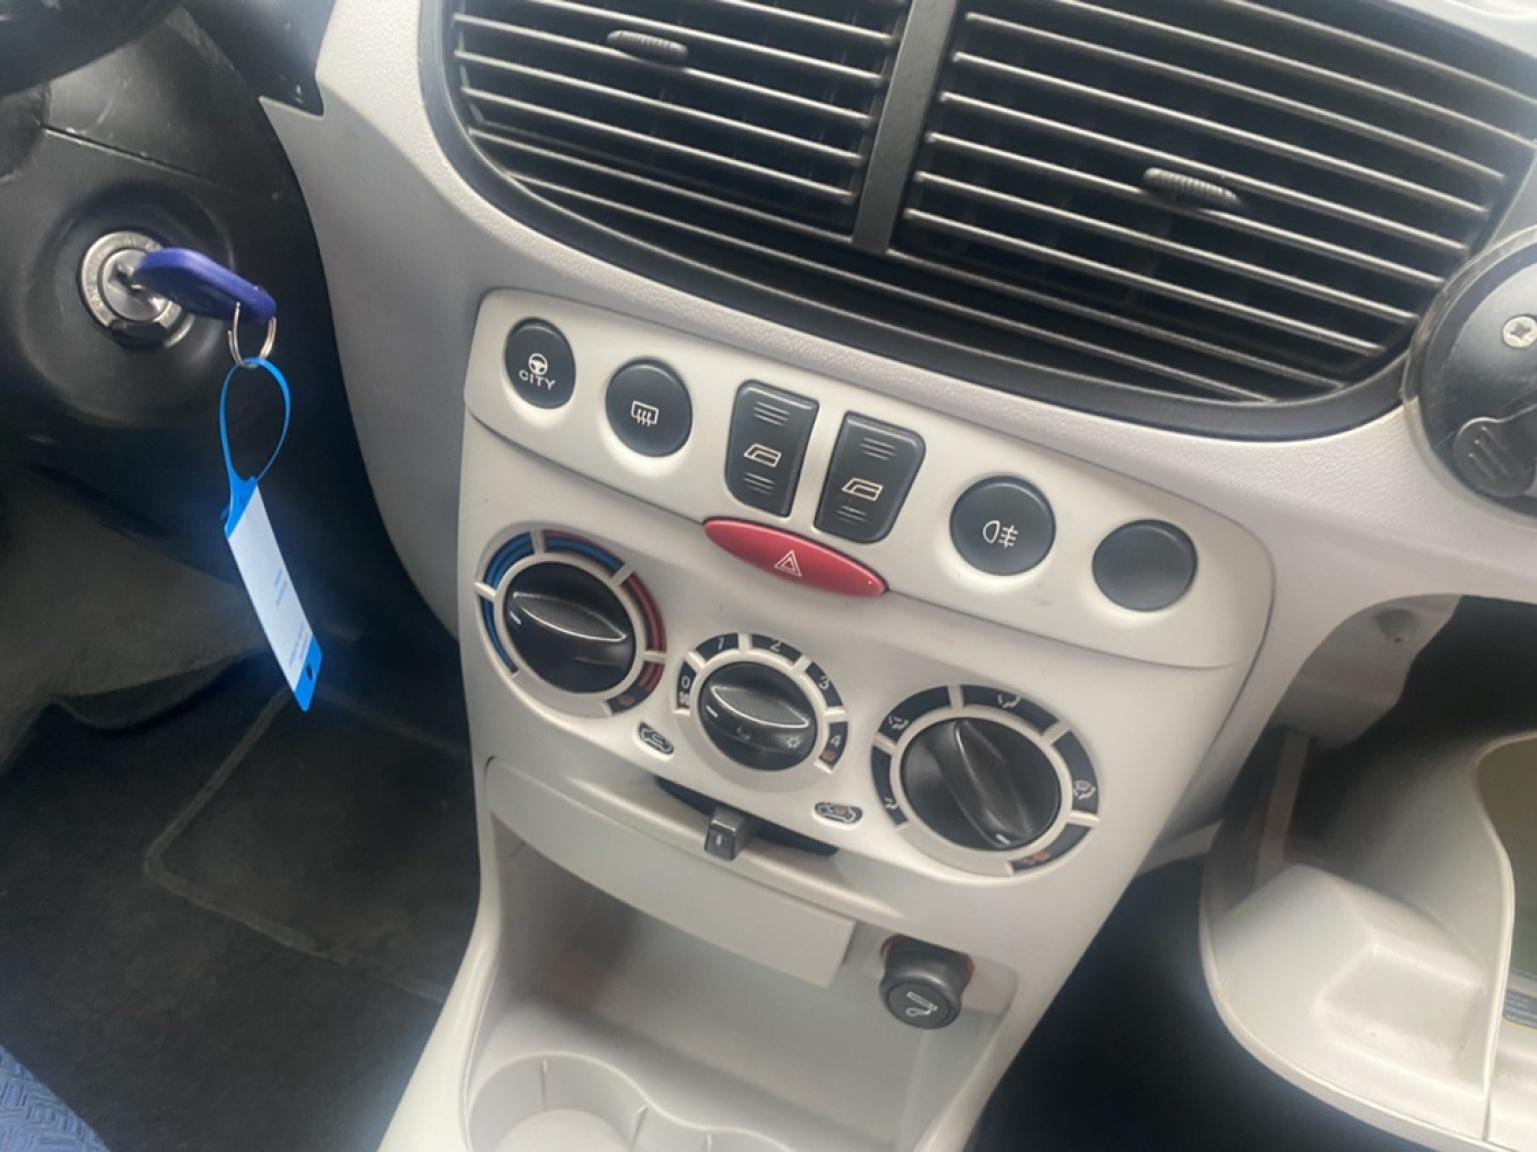 Fiat-Punto-9